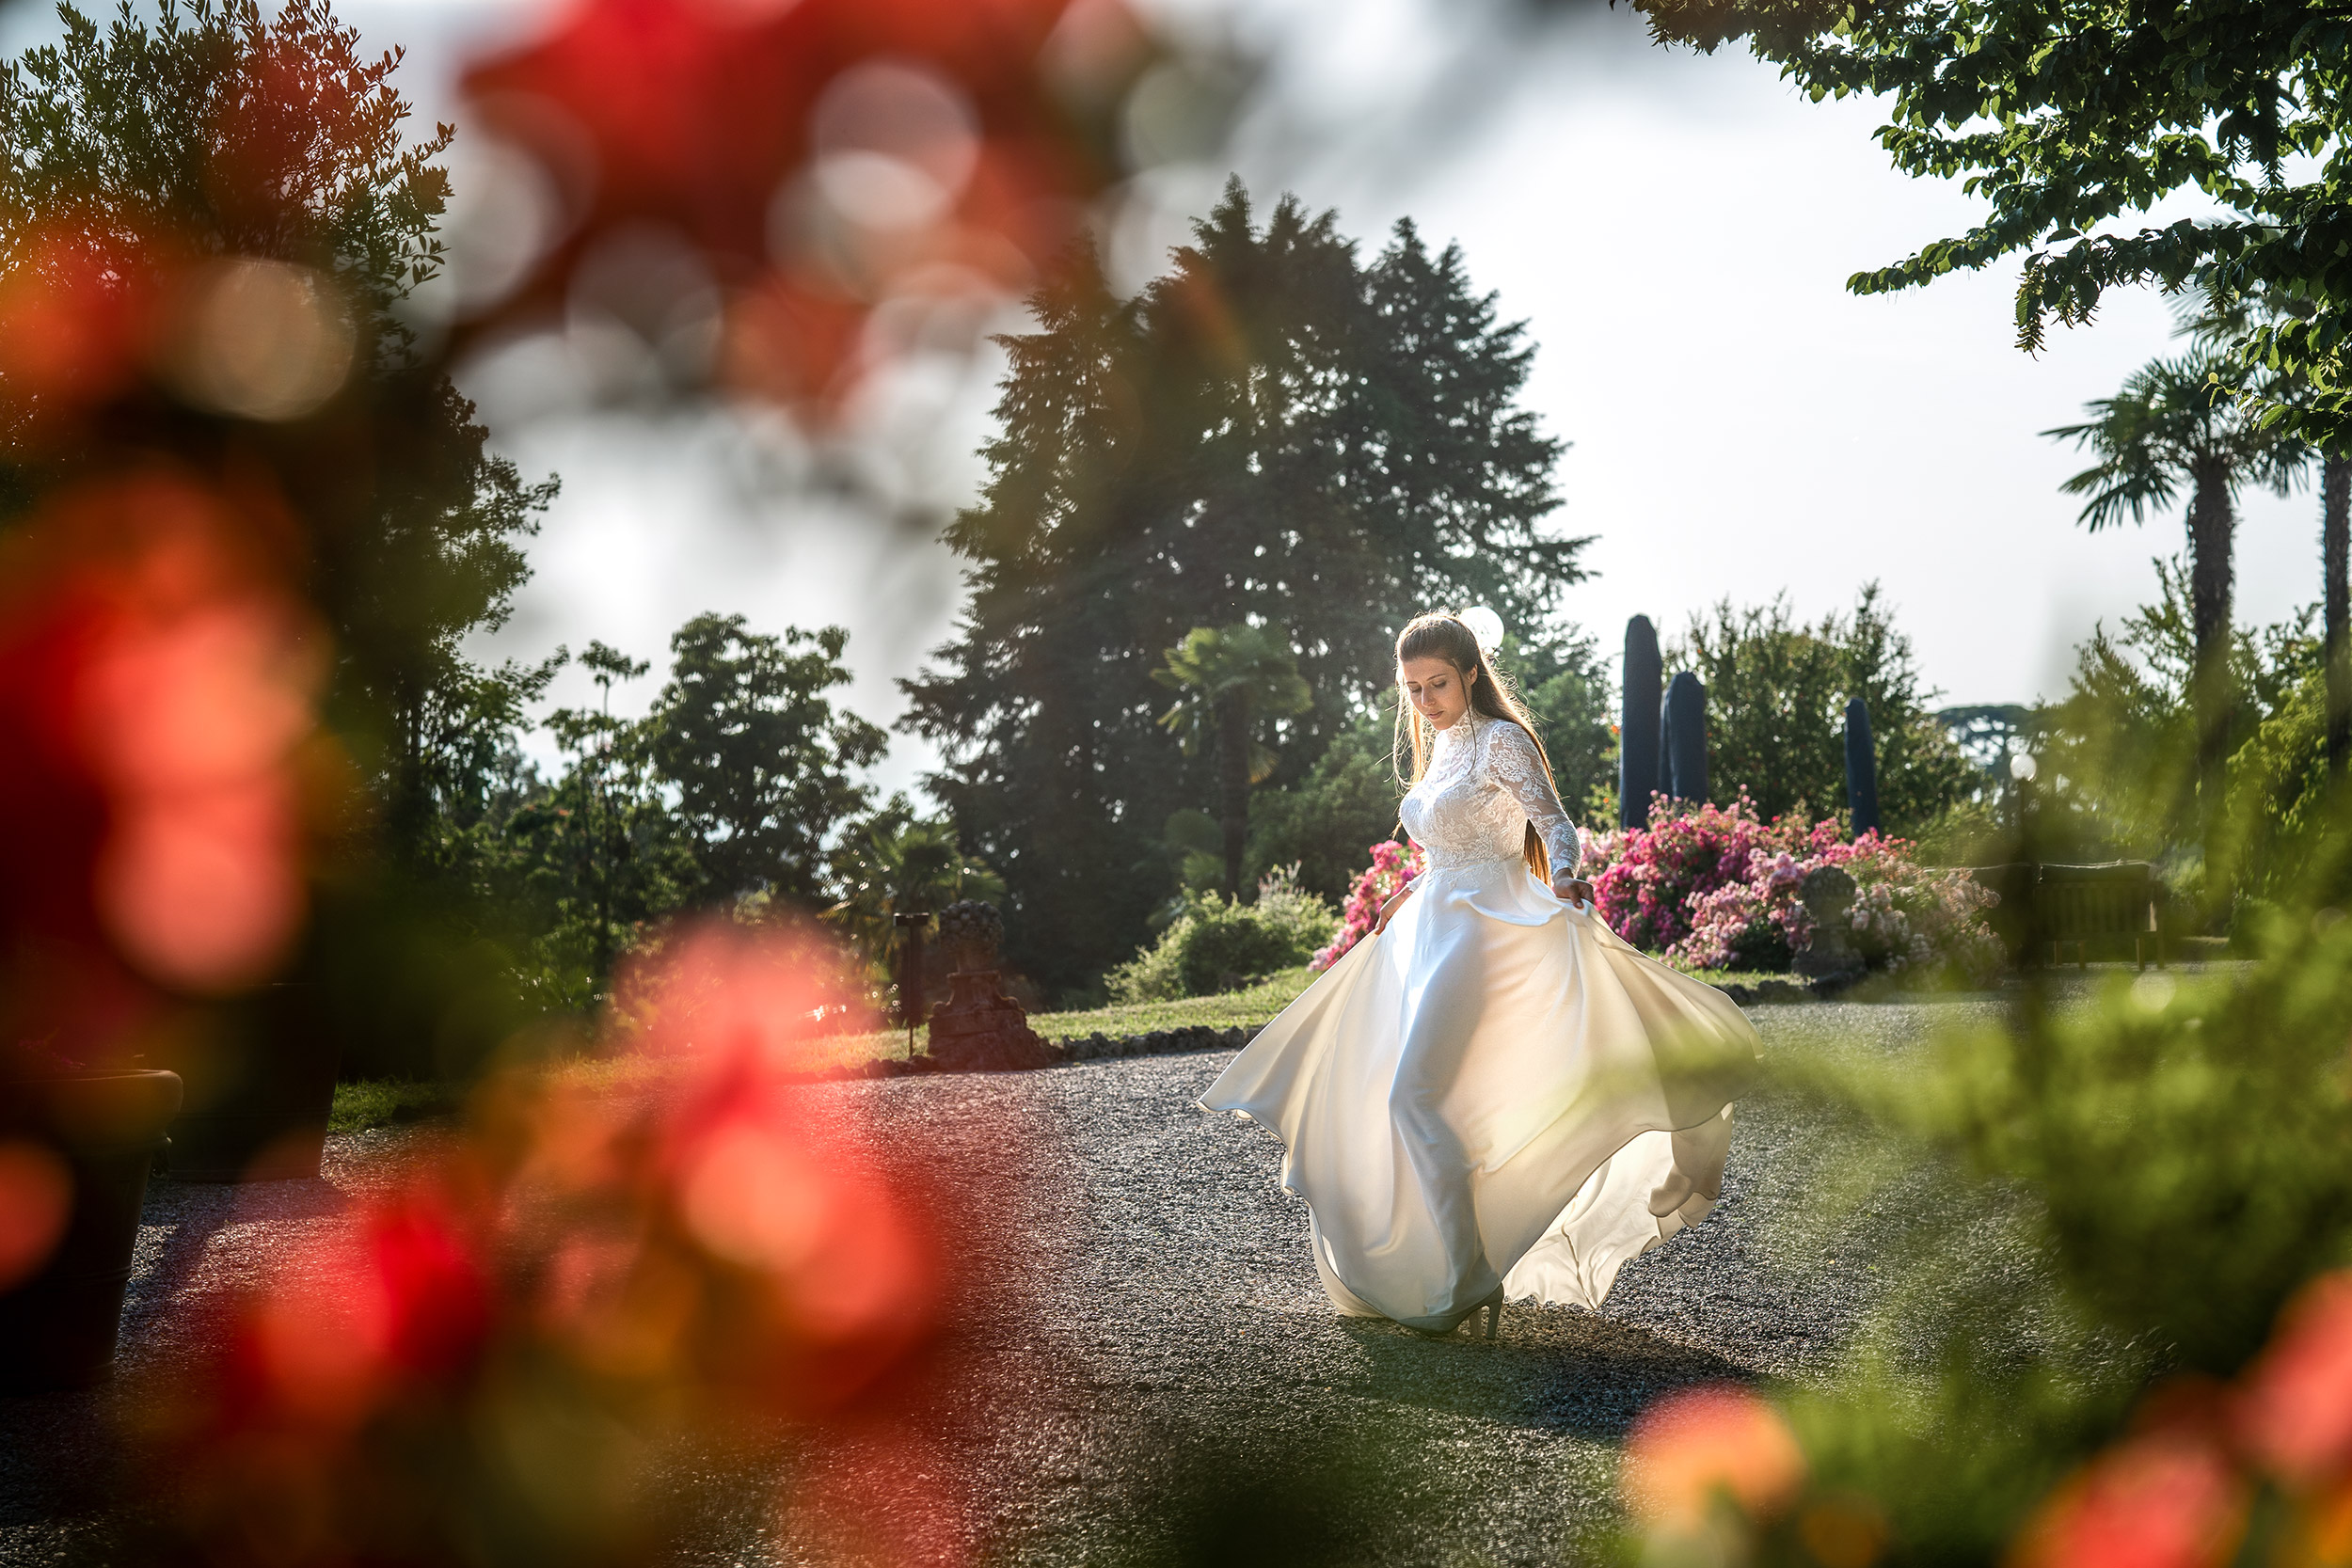 041 fotografo matrimonio reportage wedding sposi giardino villa esengrini montalbano varese 1